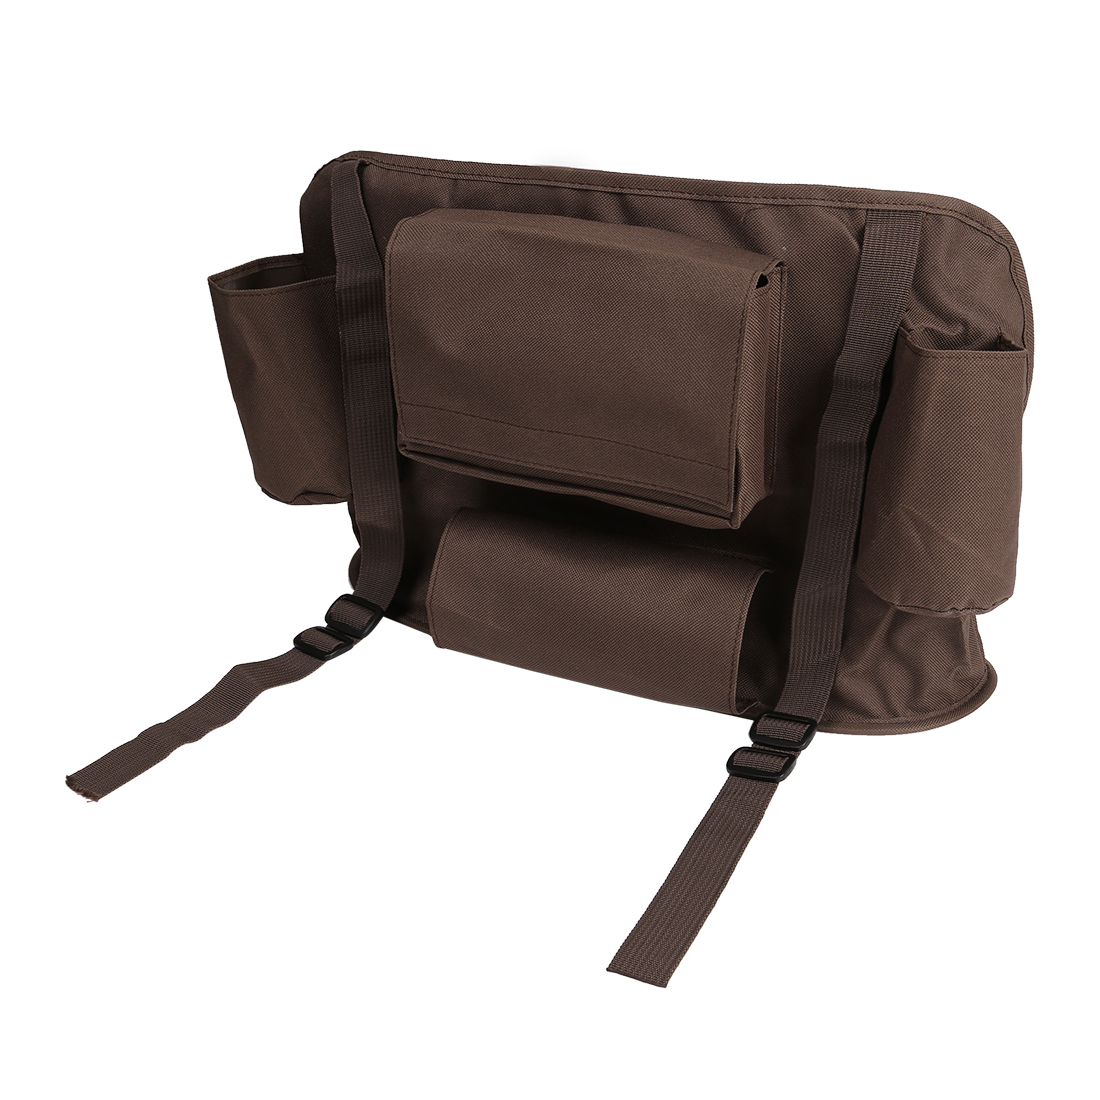 Brown Car Vehicle Back Seat Organizer Holder Travel Storage Bag Multi-Pocket